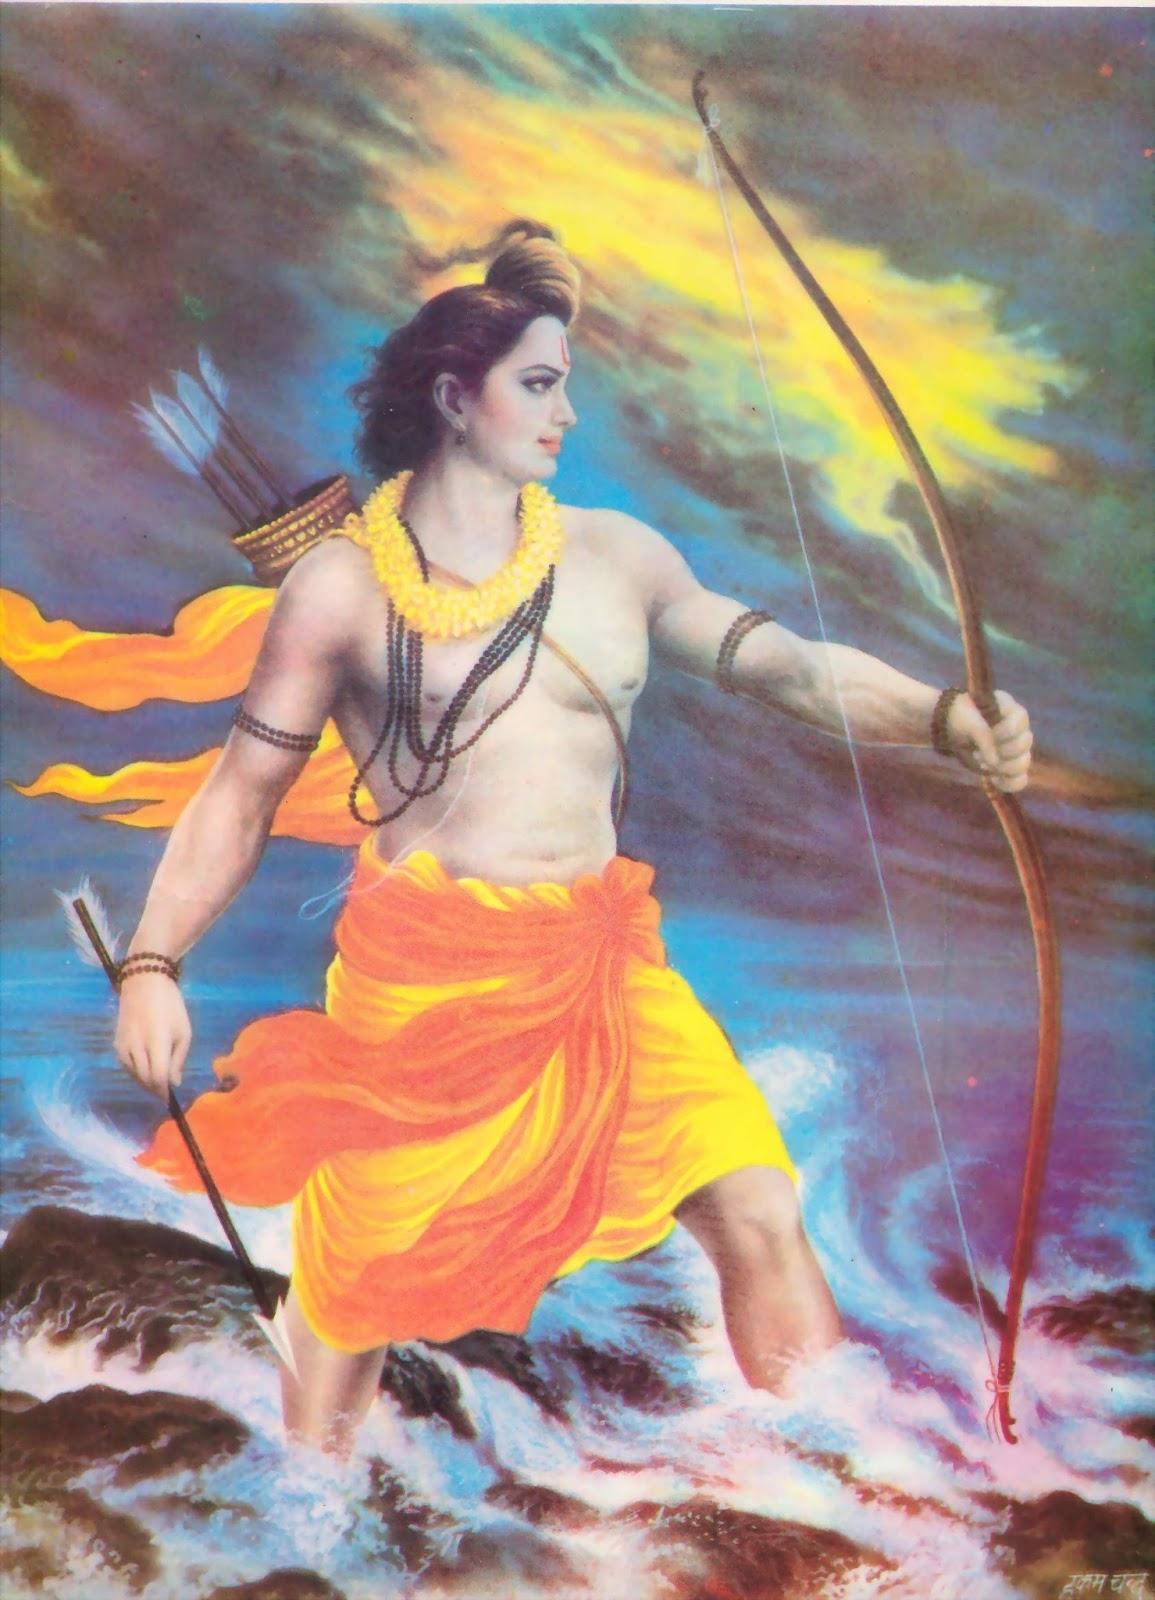 Hd Wallpaper Graphic Load Shri Ramgod Ram Sitaram Lakhan Sita